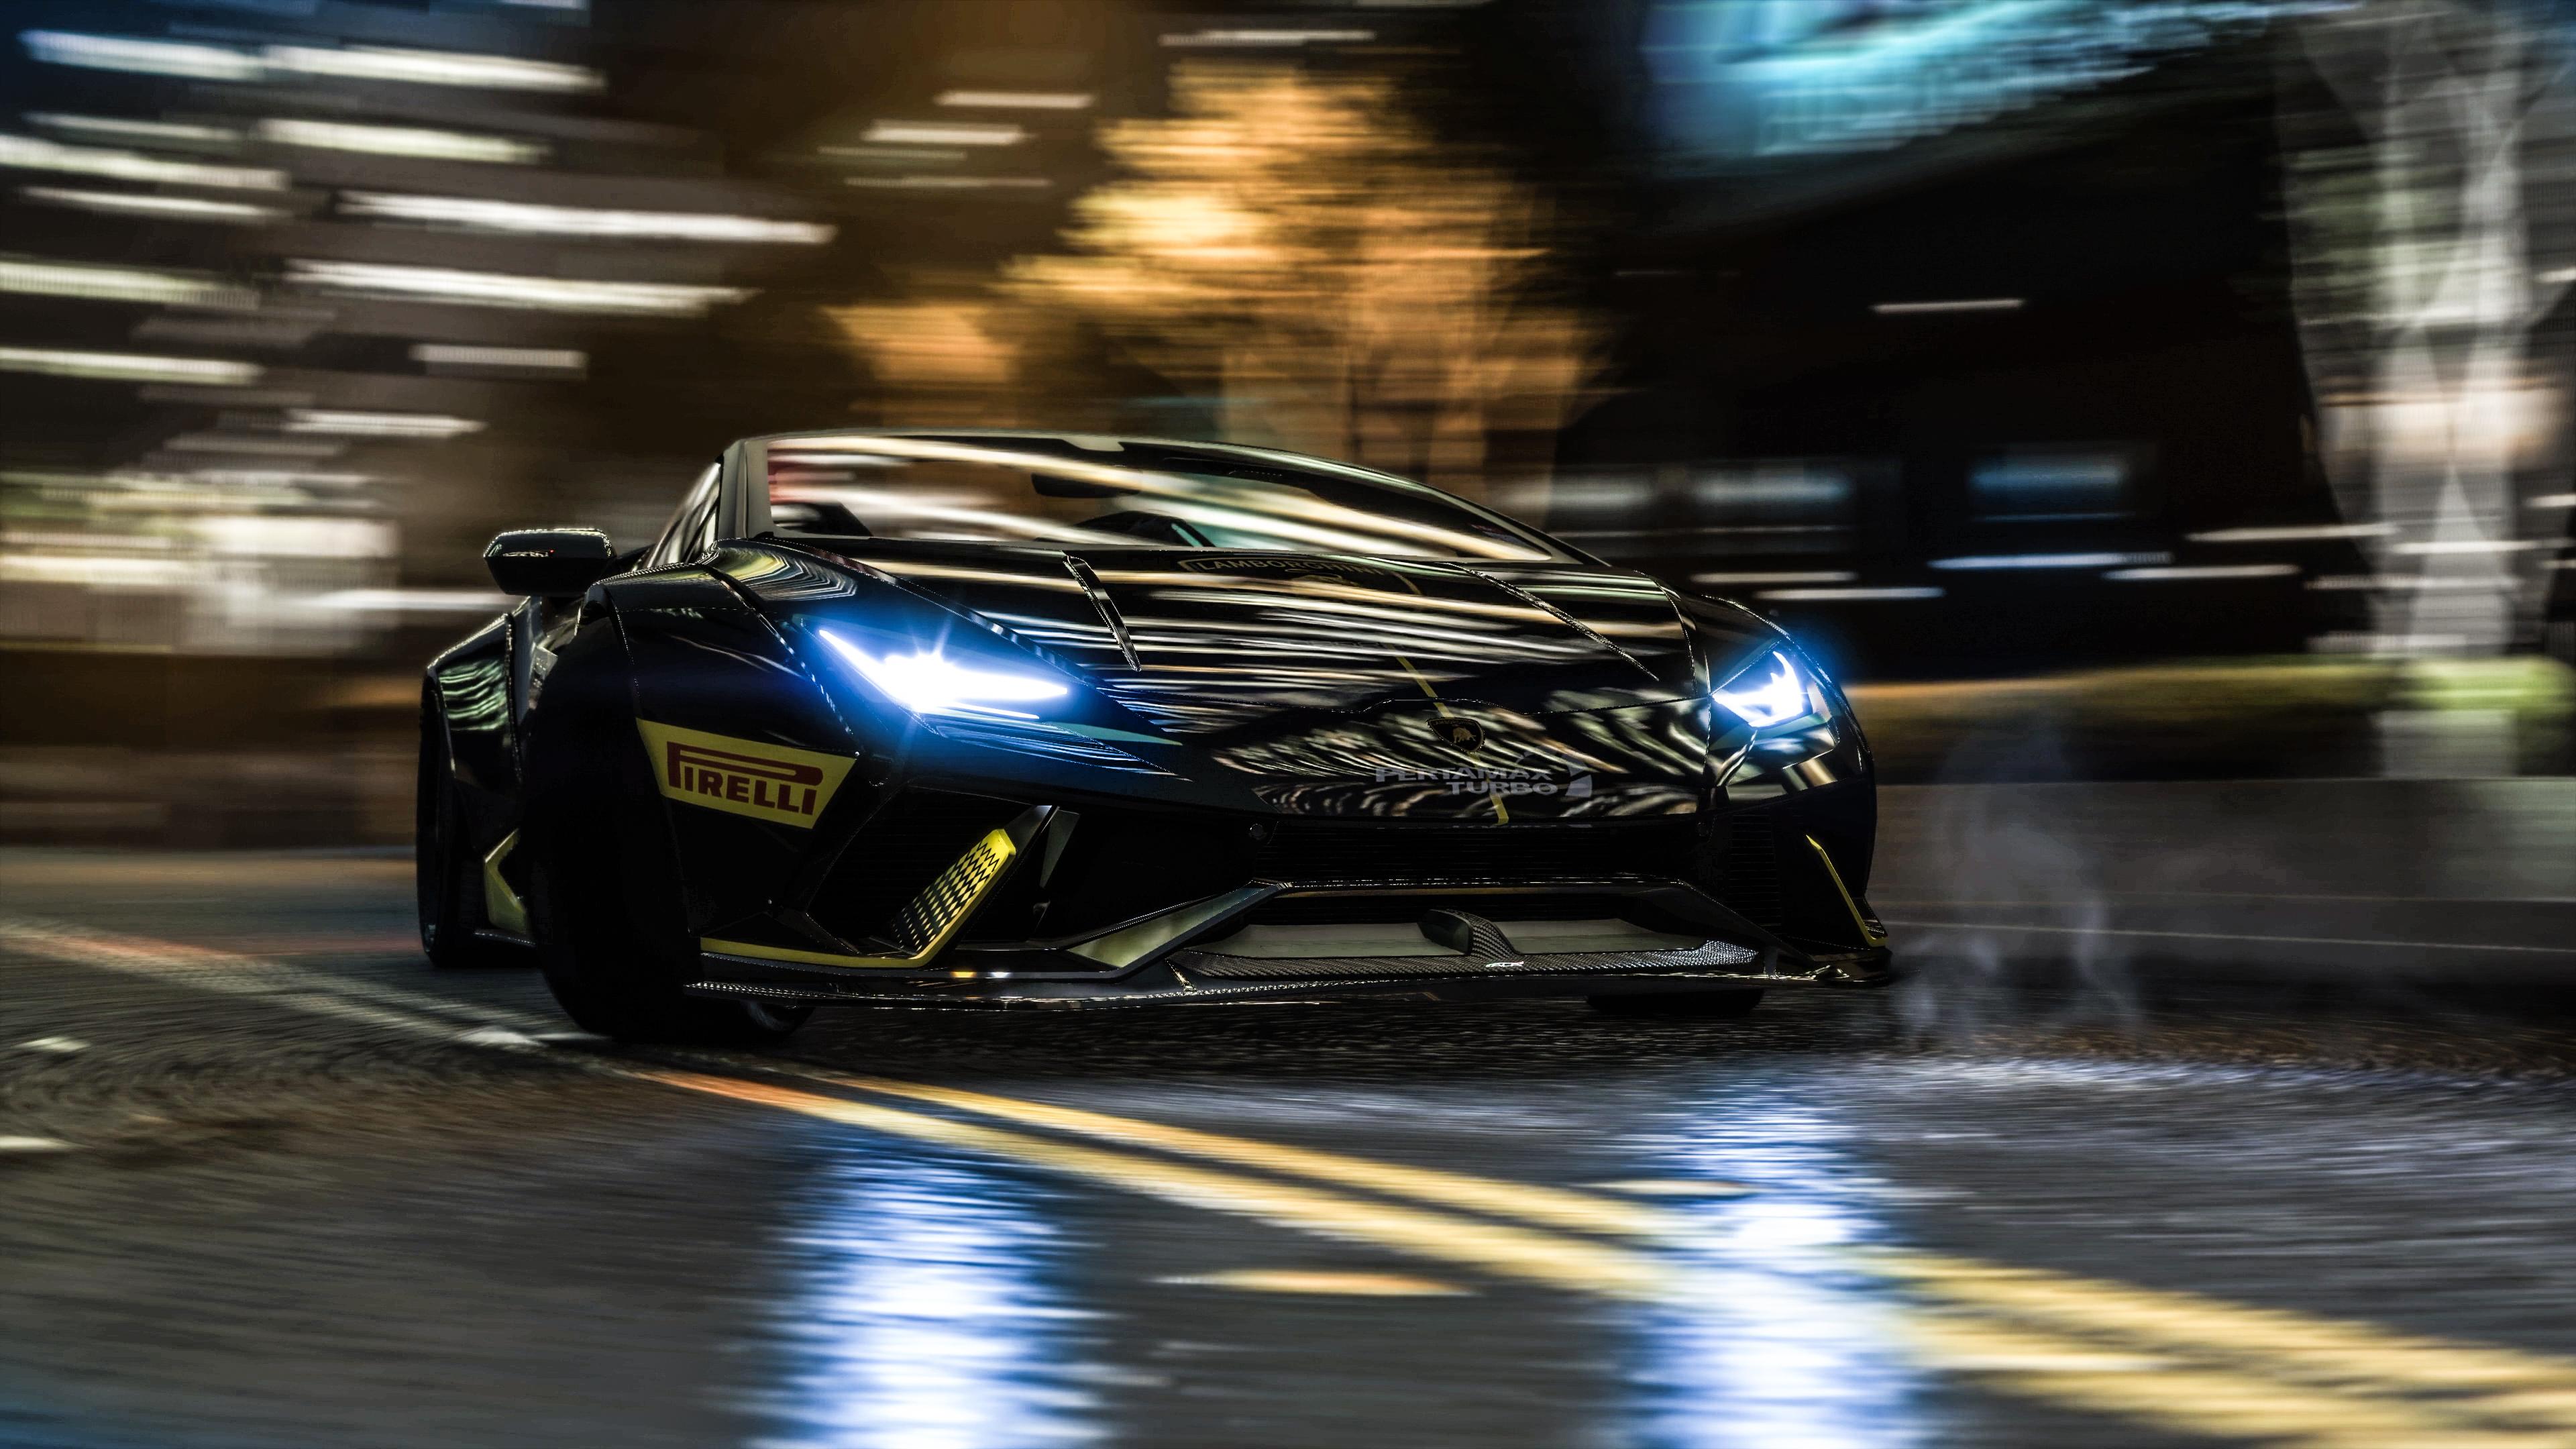 2048x1152 Gta V Redux Nature 2048x1152 Resolution Hd 4k: GTA V Lamborghini In Motion 4k, HD Games, 4k Wallpapers